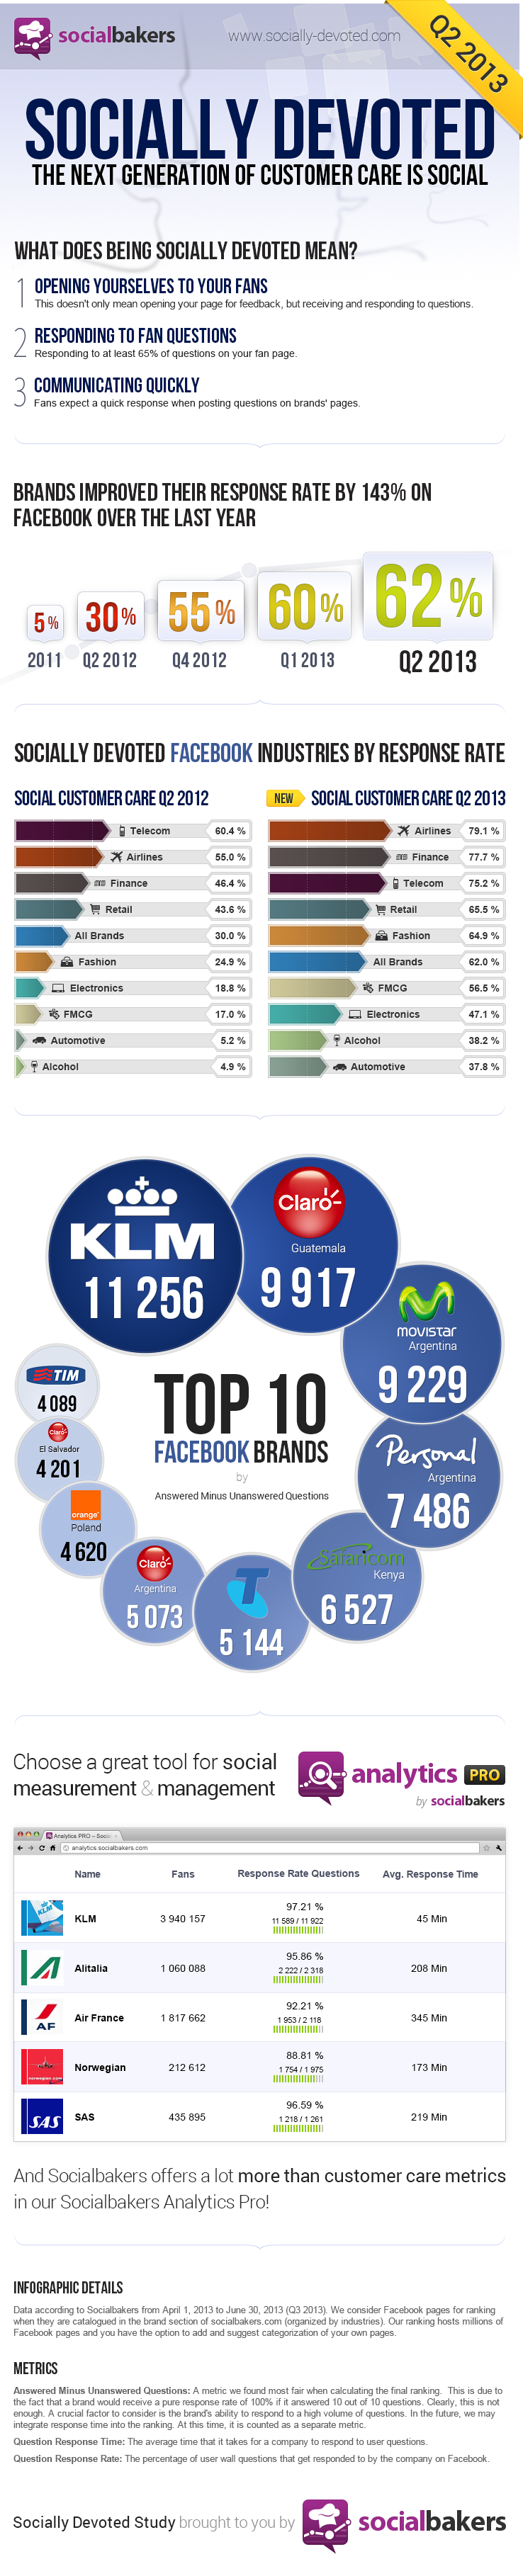 sociallydevoted-q2-2013